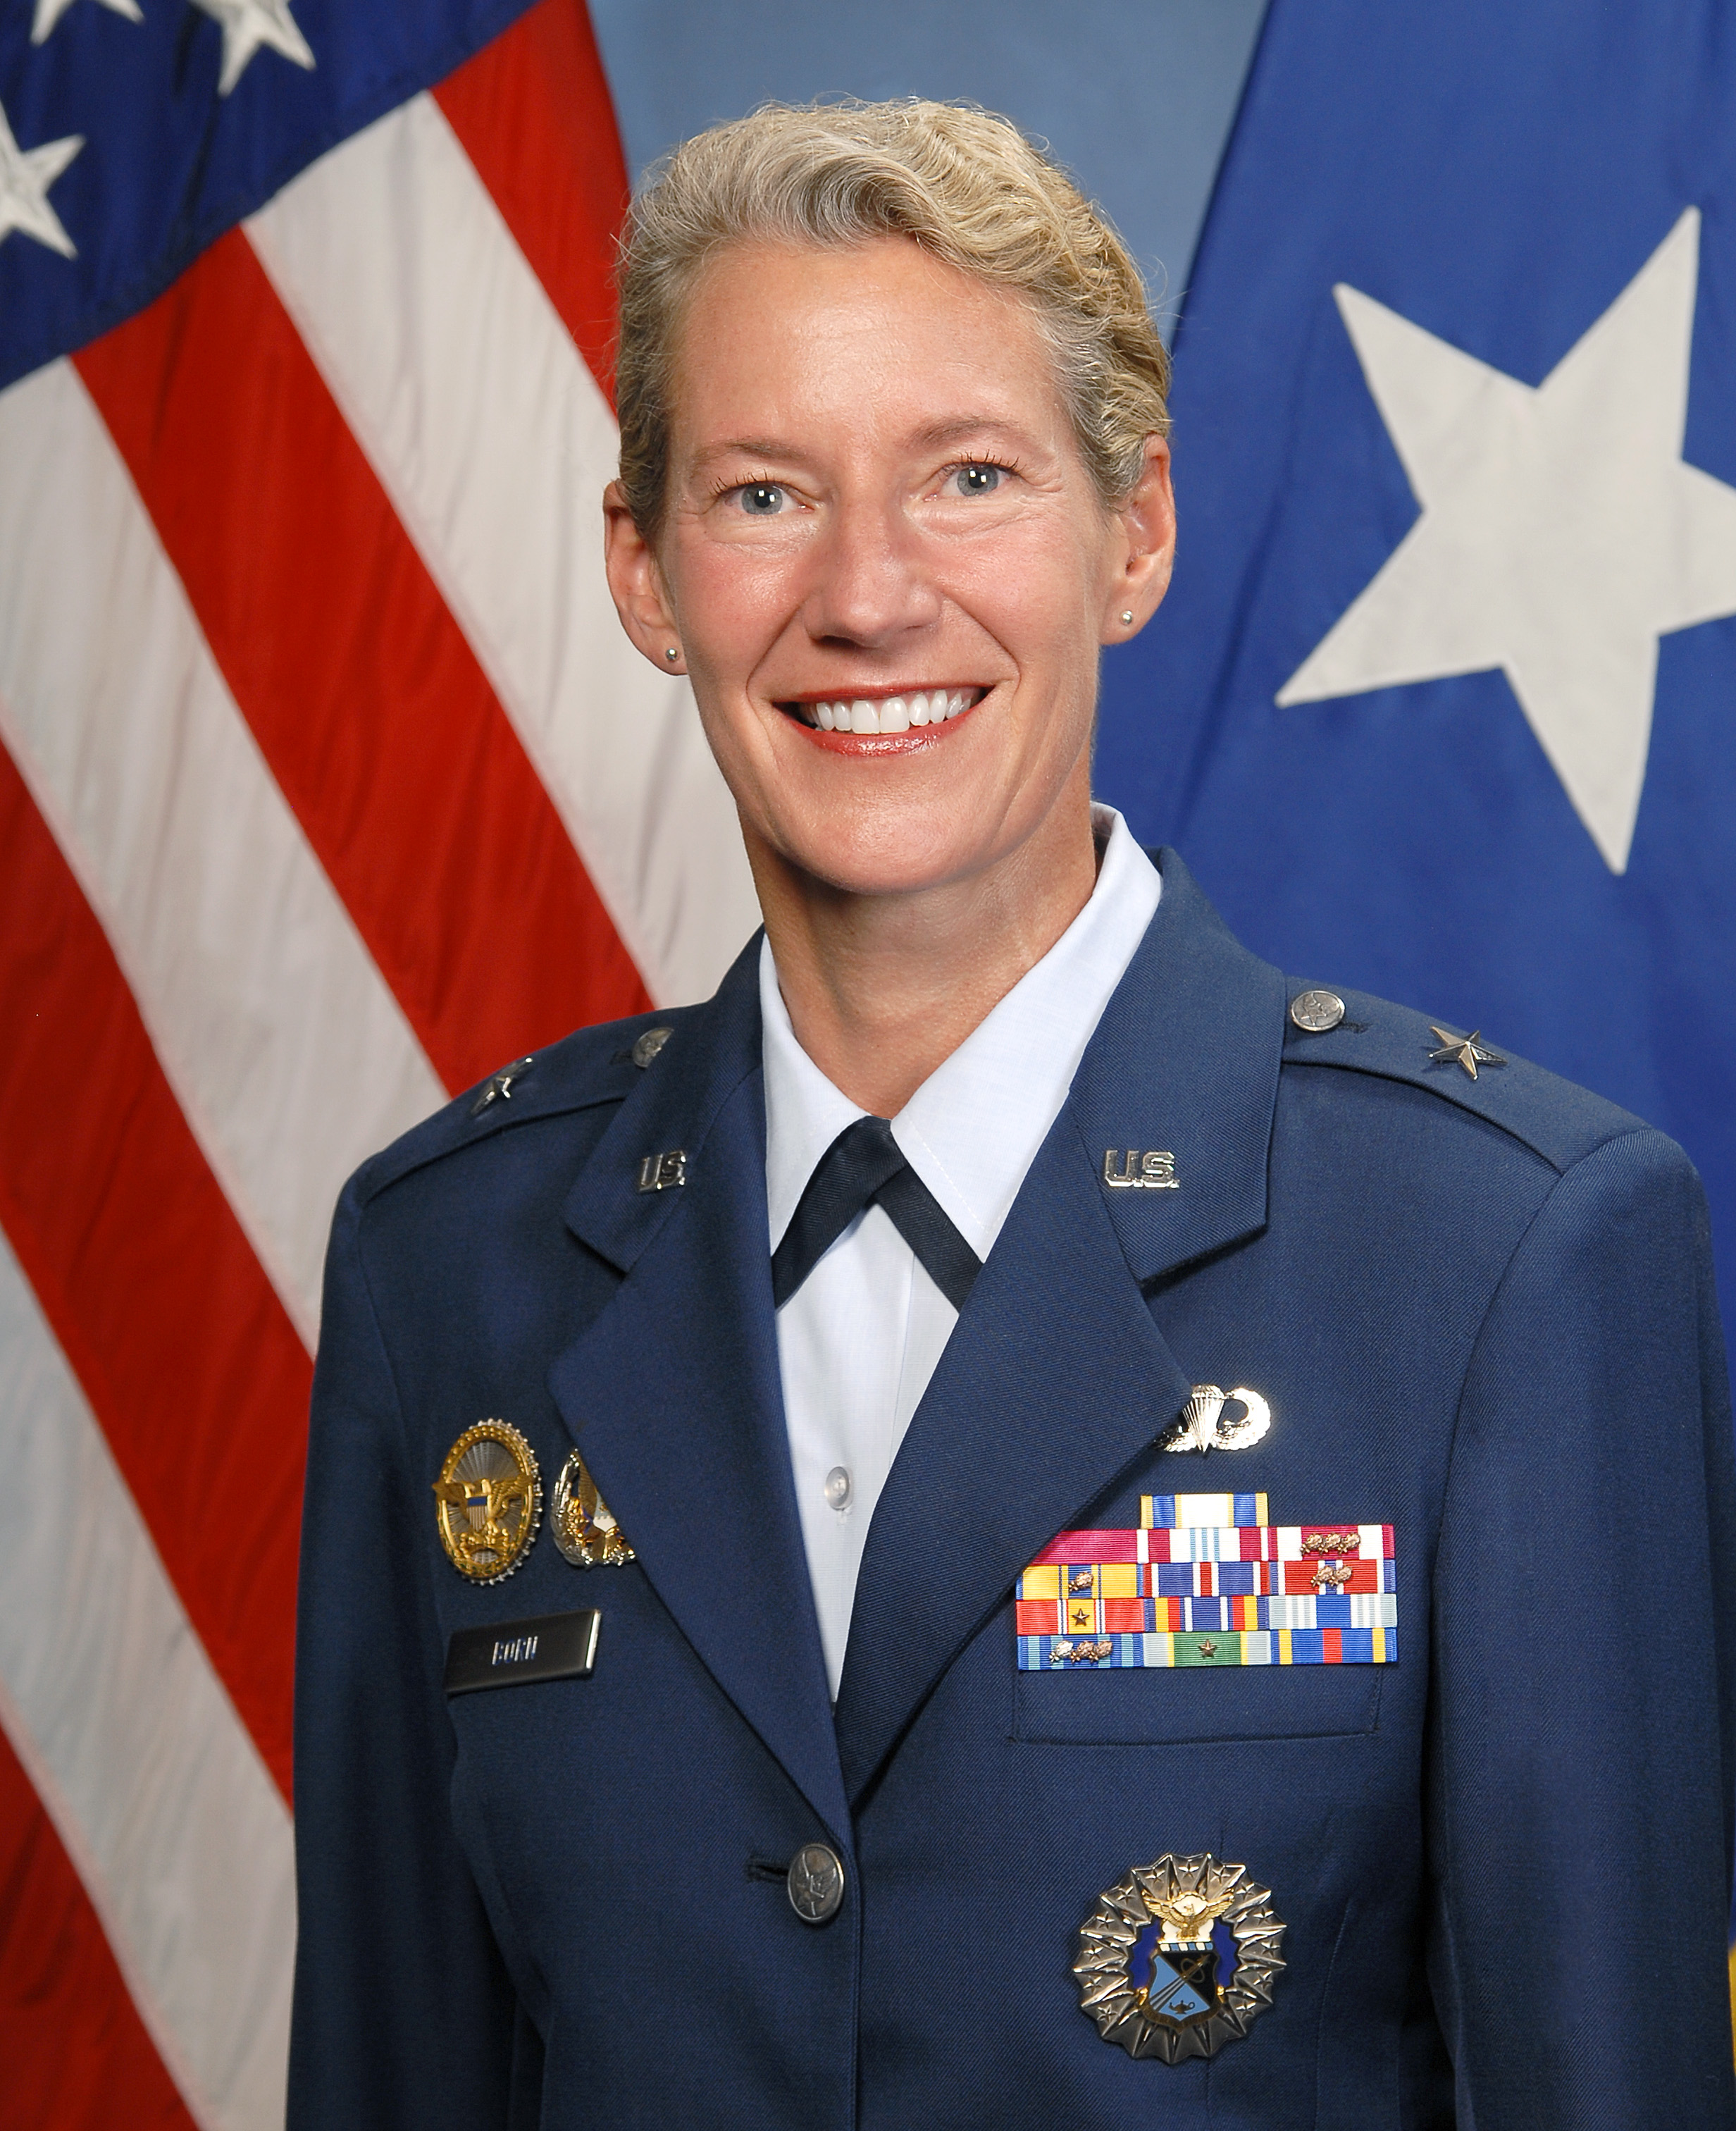 Air Force Academy Dean Of Faculty Announces Retirement: BRIGADIER GENERAL DANA H. BORN > U.S. Air Force